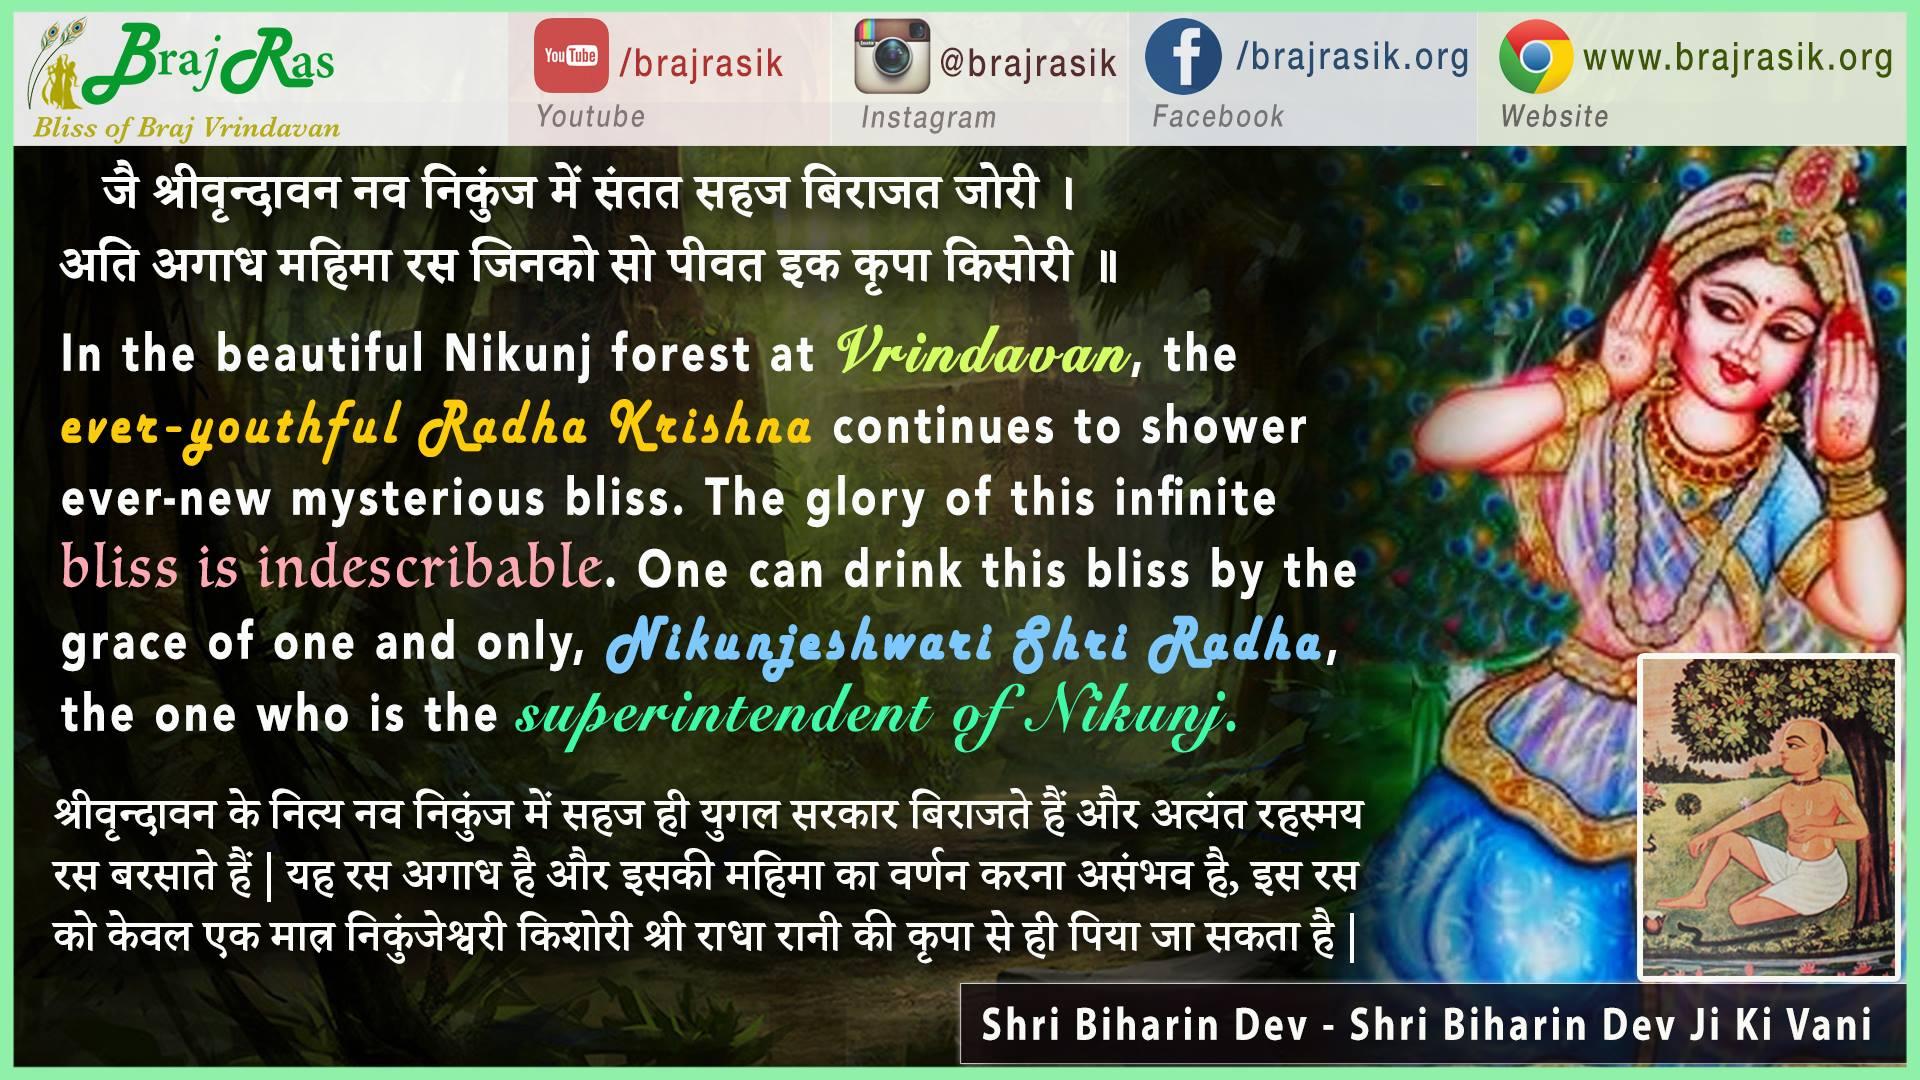 Jai Shri Vrindavan Nav Nikunj Mein Santat Birajat Jori - Quote by Shri Biharin Dev - Shri Biharin Dev Ji Ki Vani